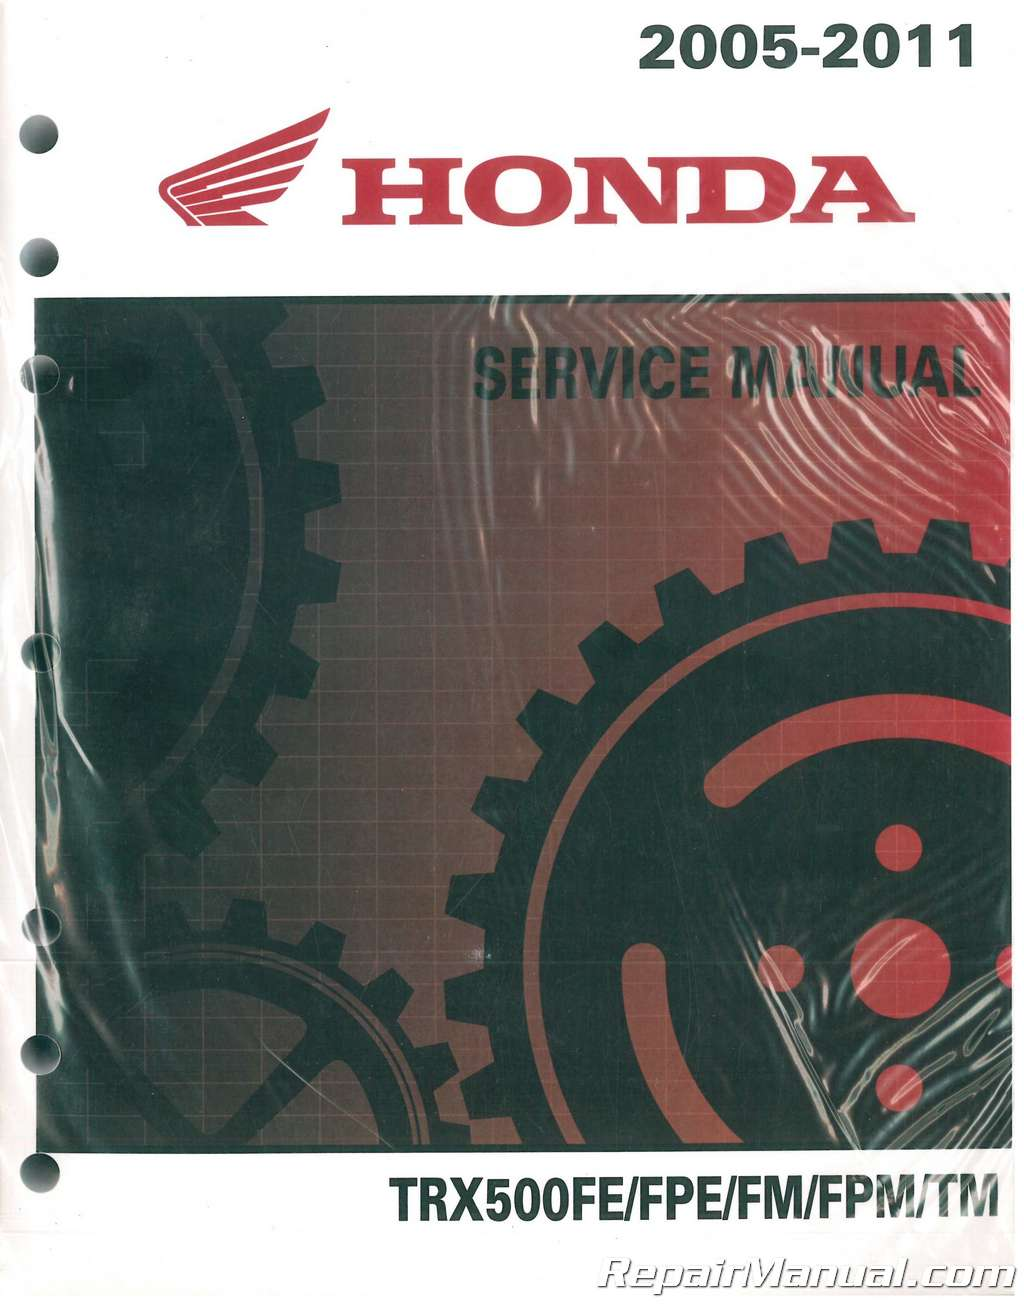 2005-2011 Honda TRX500FE FPE FM FPM TM Fourtrax Foreman ATV Service Manual